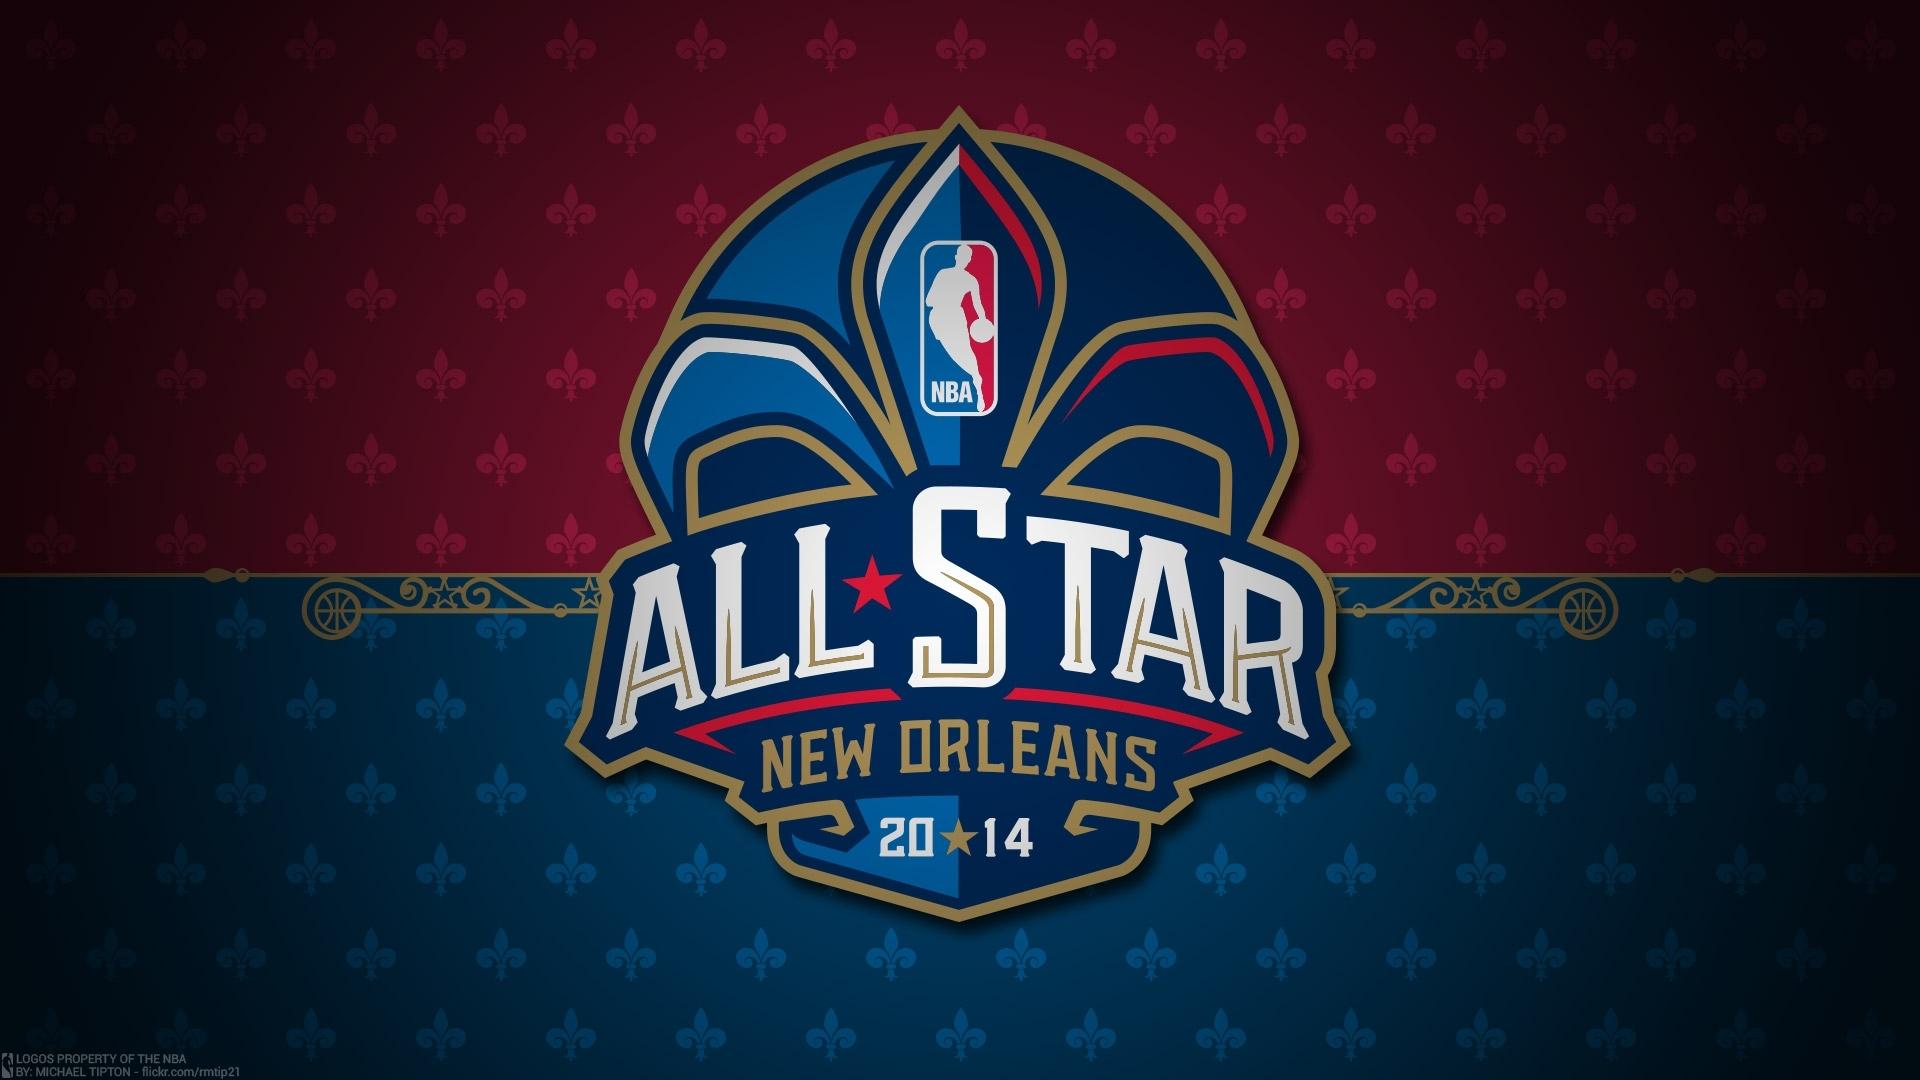 nba all-star wallpapers | basketball wallpapers at basketwallpapers